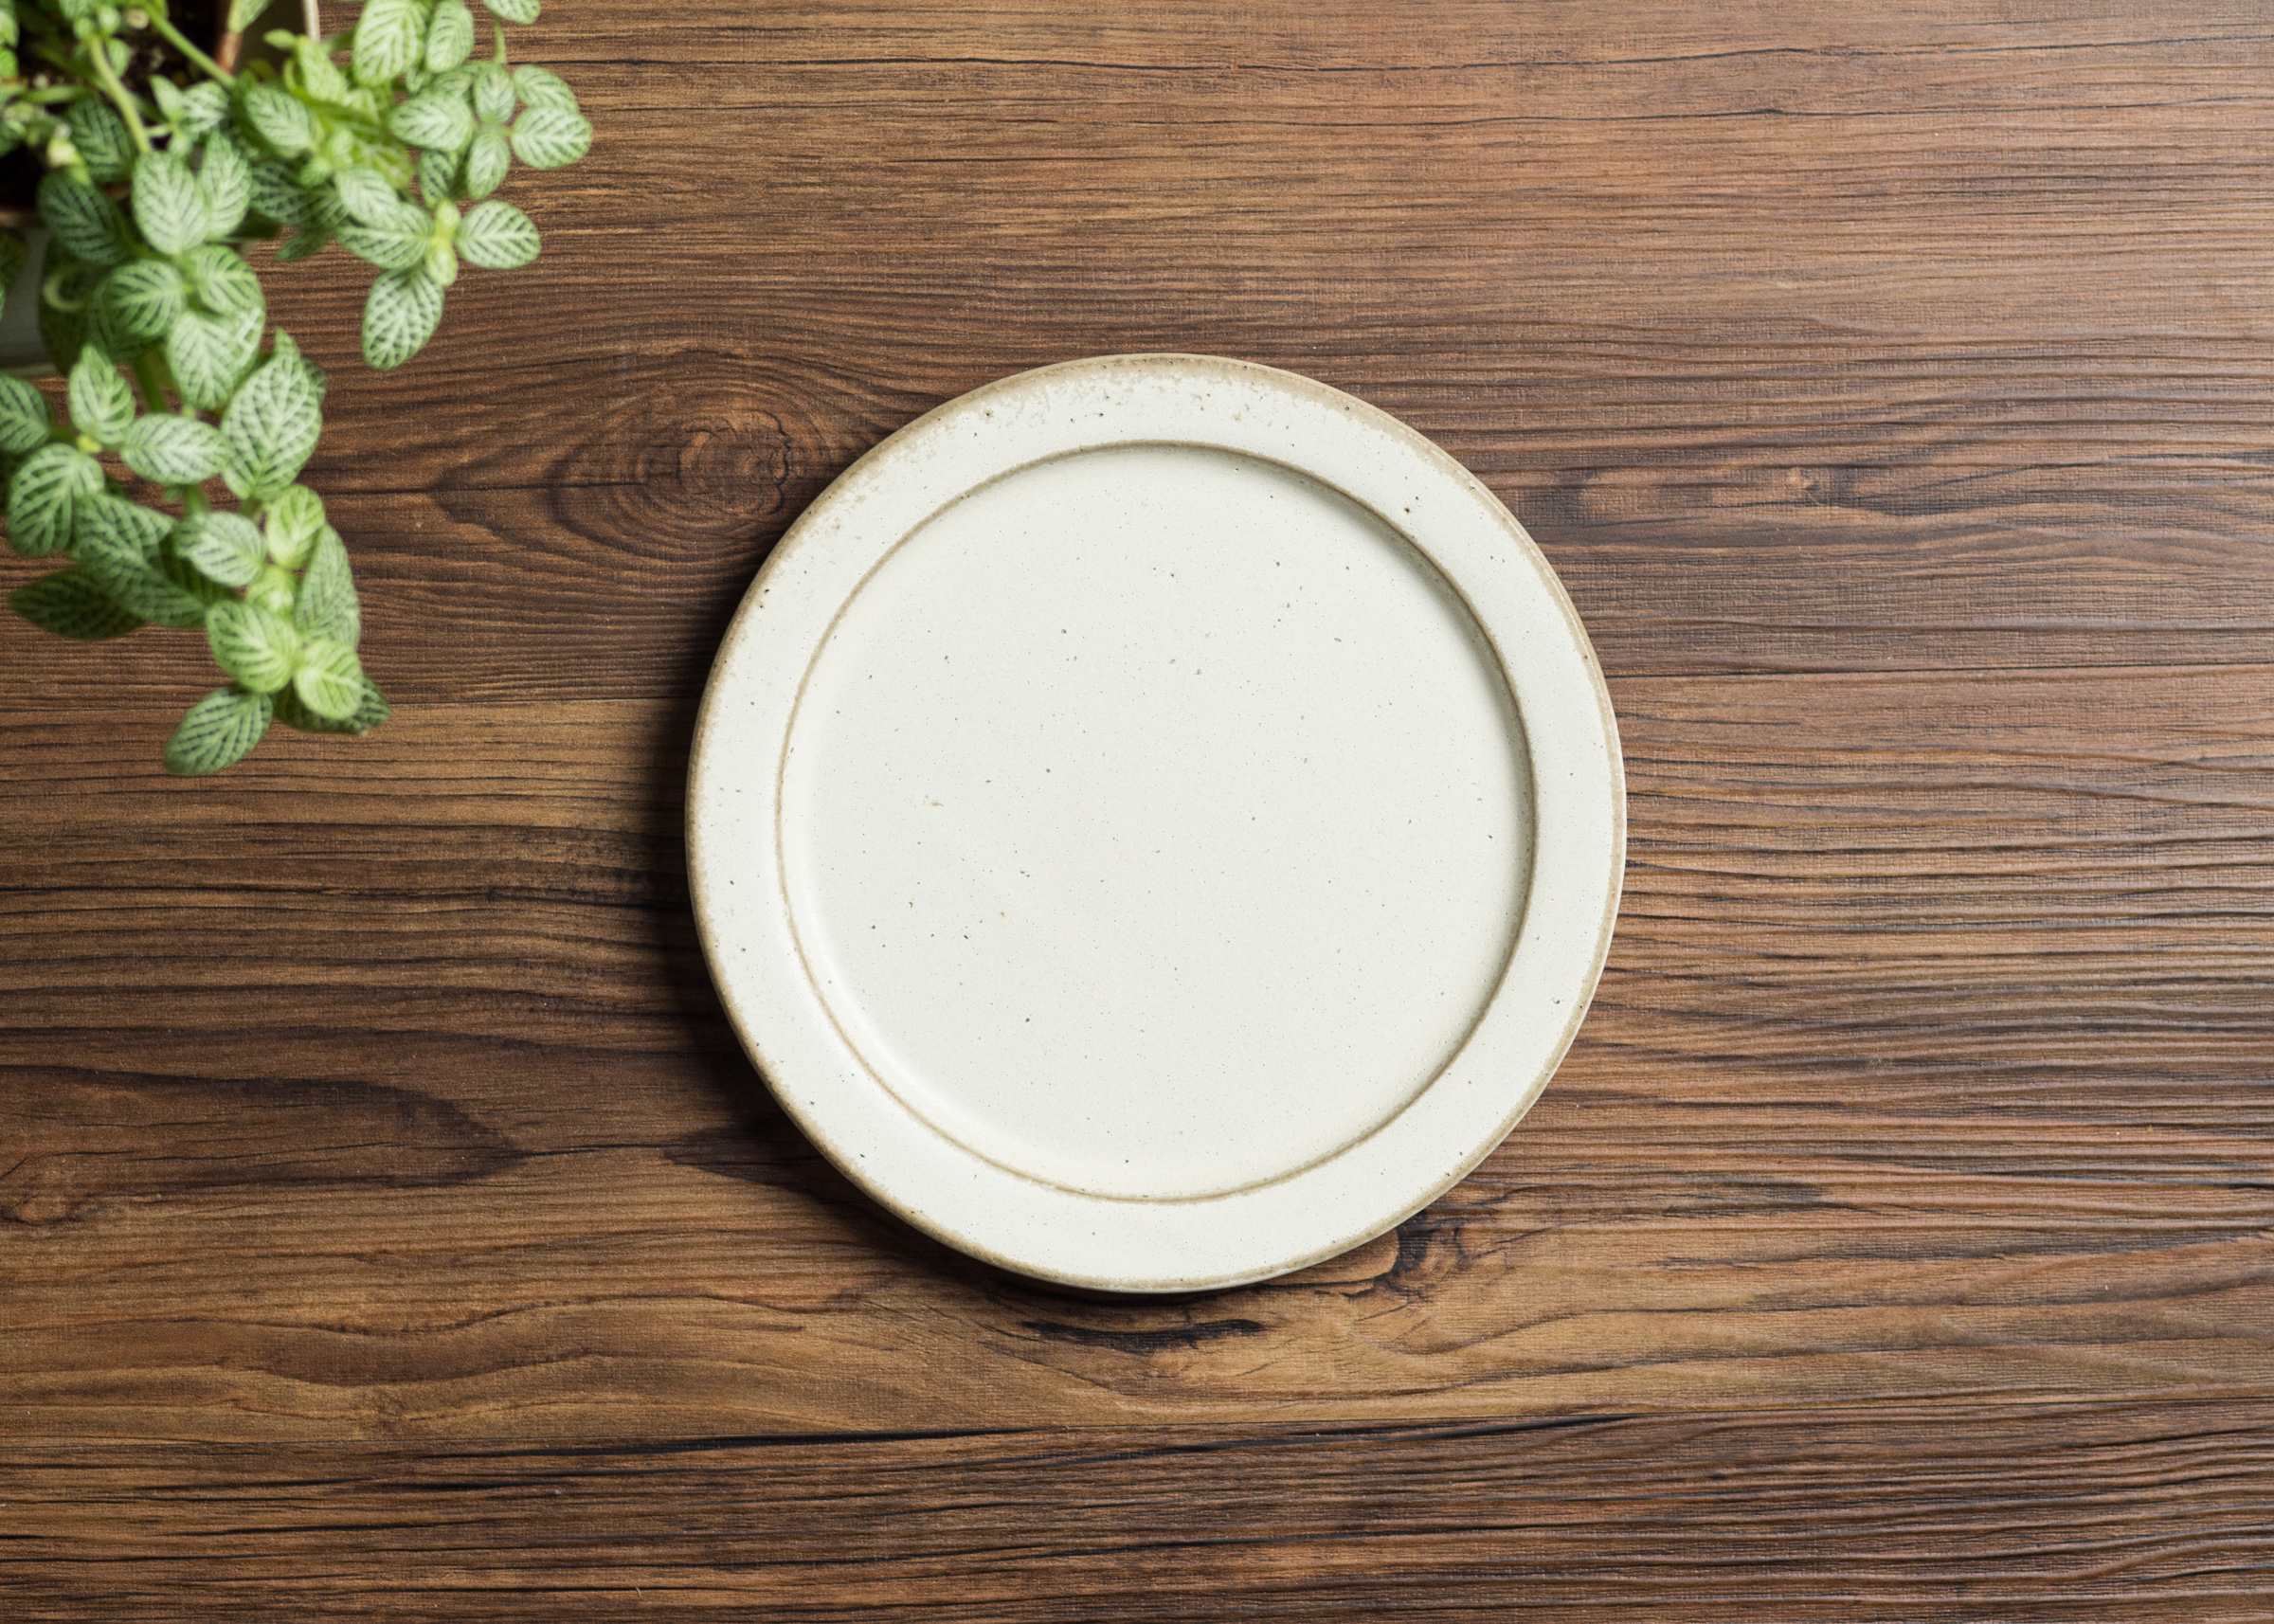 SHIROUMA 洋皿 18cm 白 中皿 プレート/長谷川 哲也